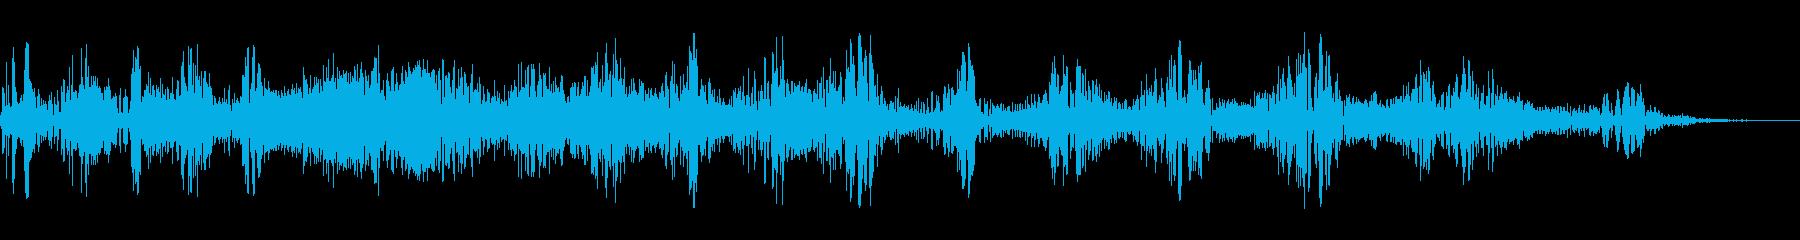 SynthSwipe EC06_57_2の再生済みの波形